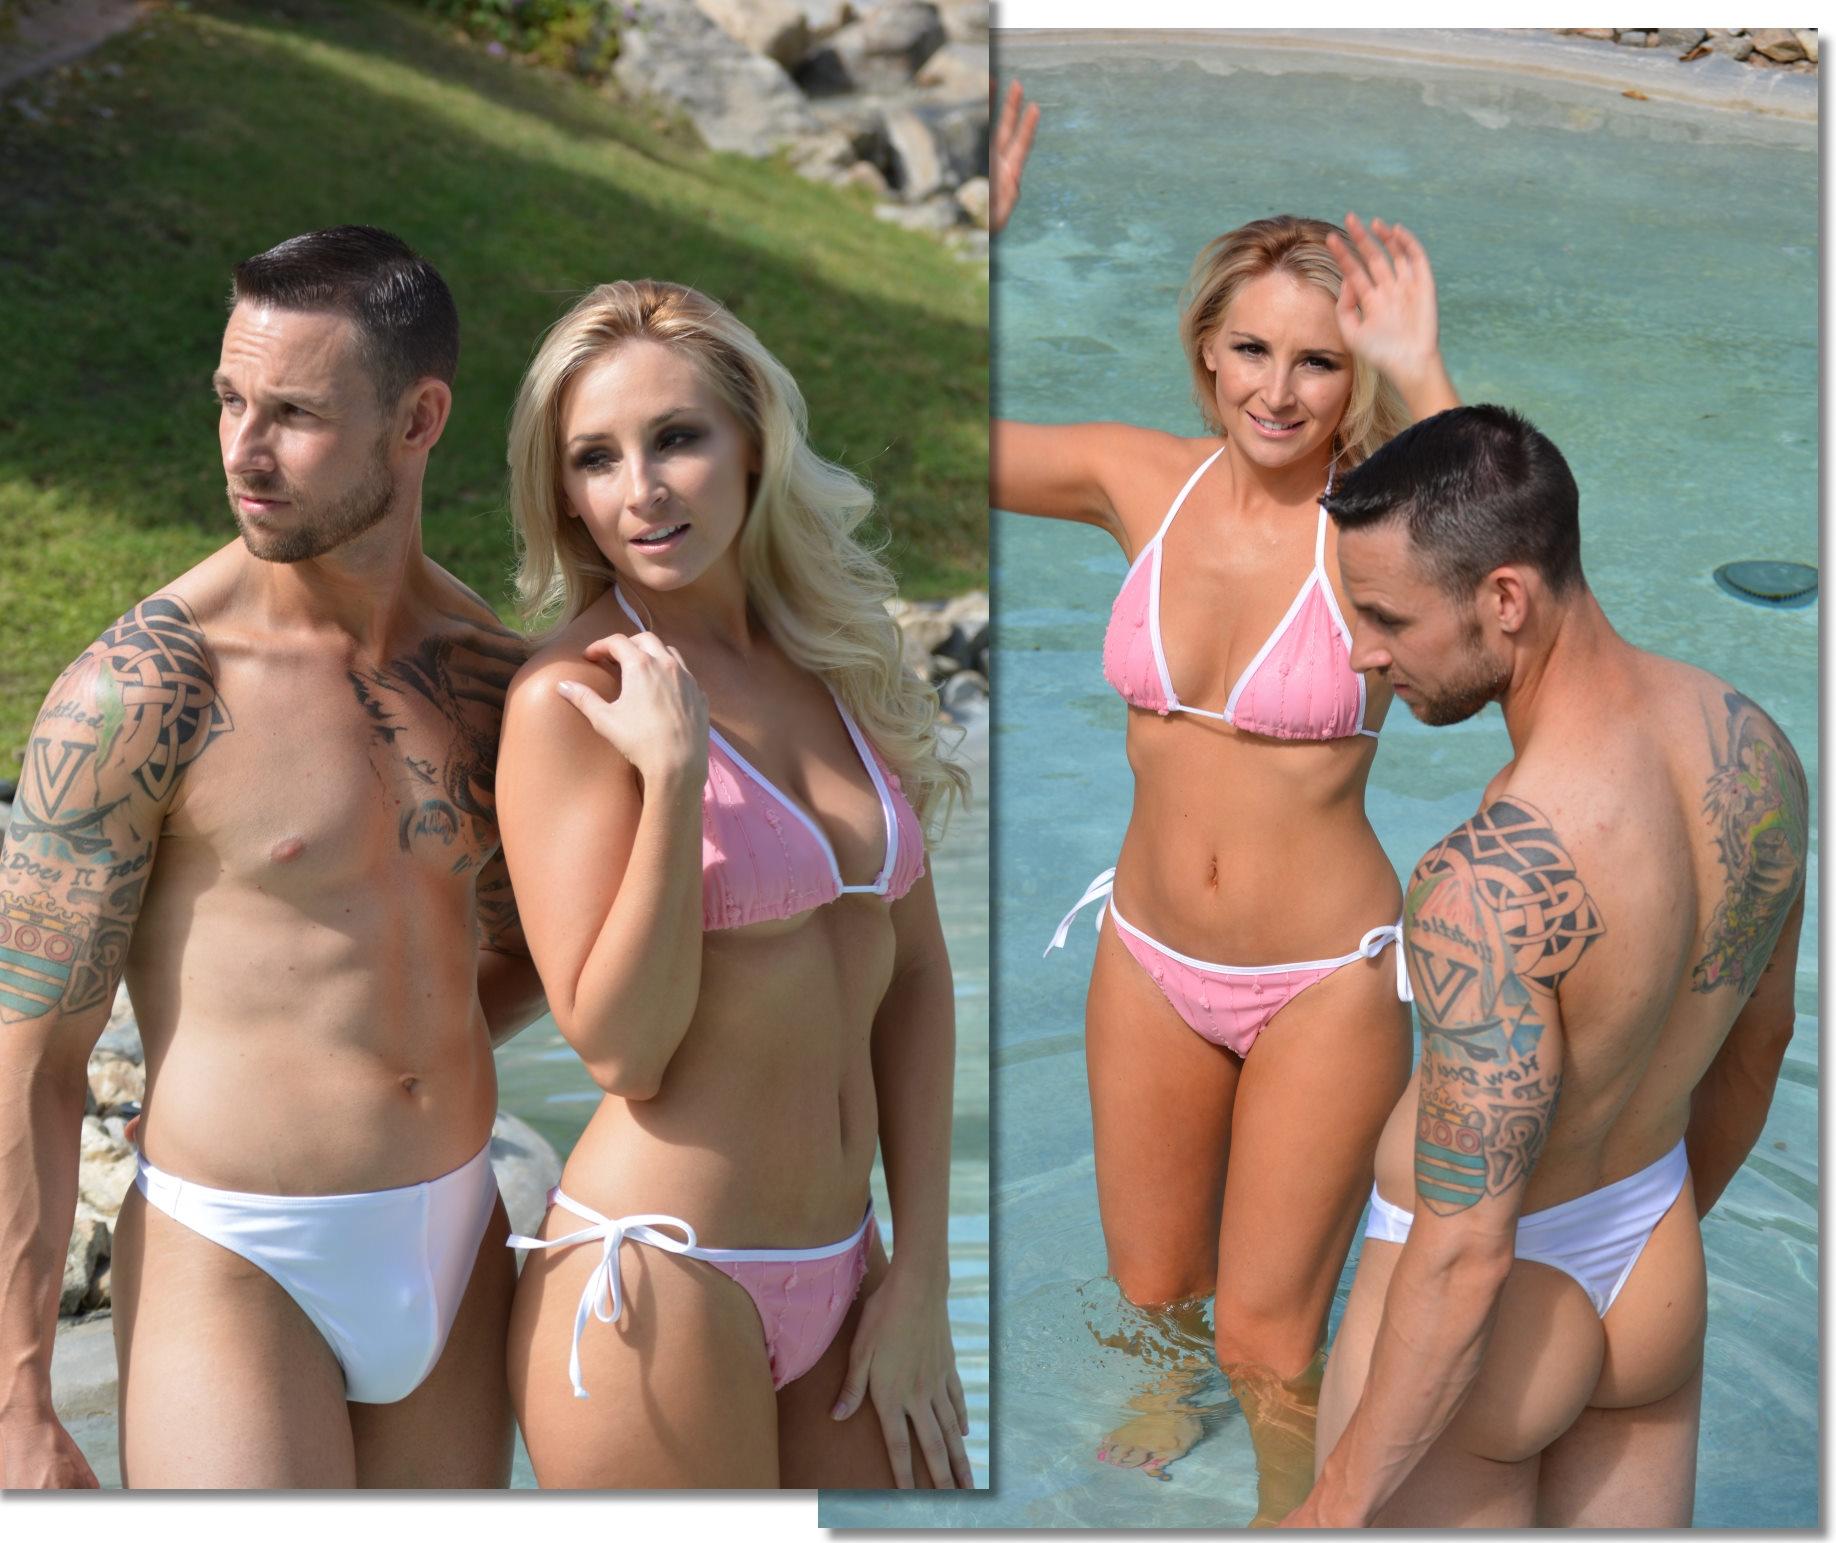 Men bikini public pool